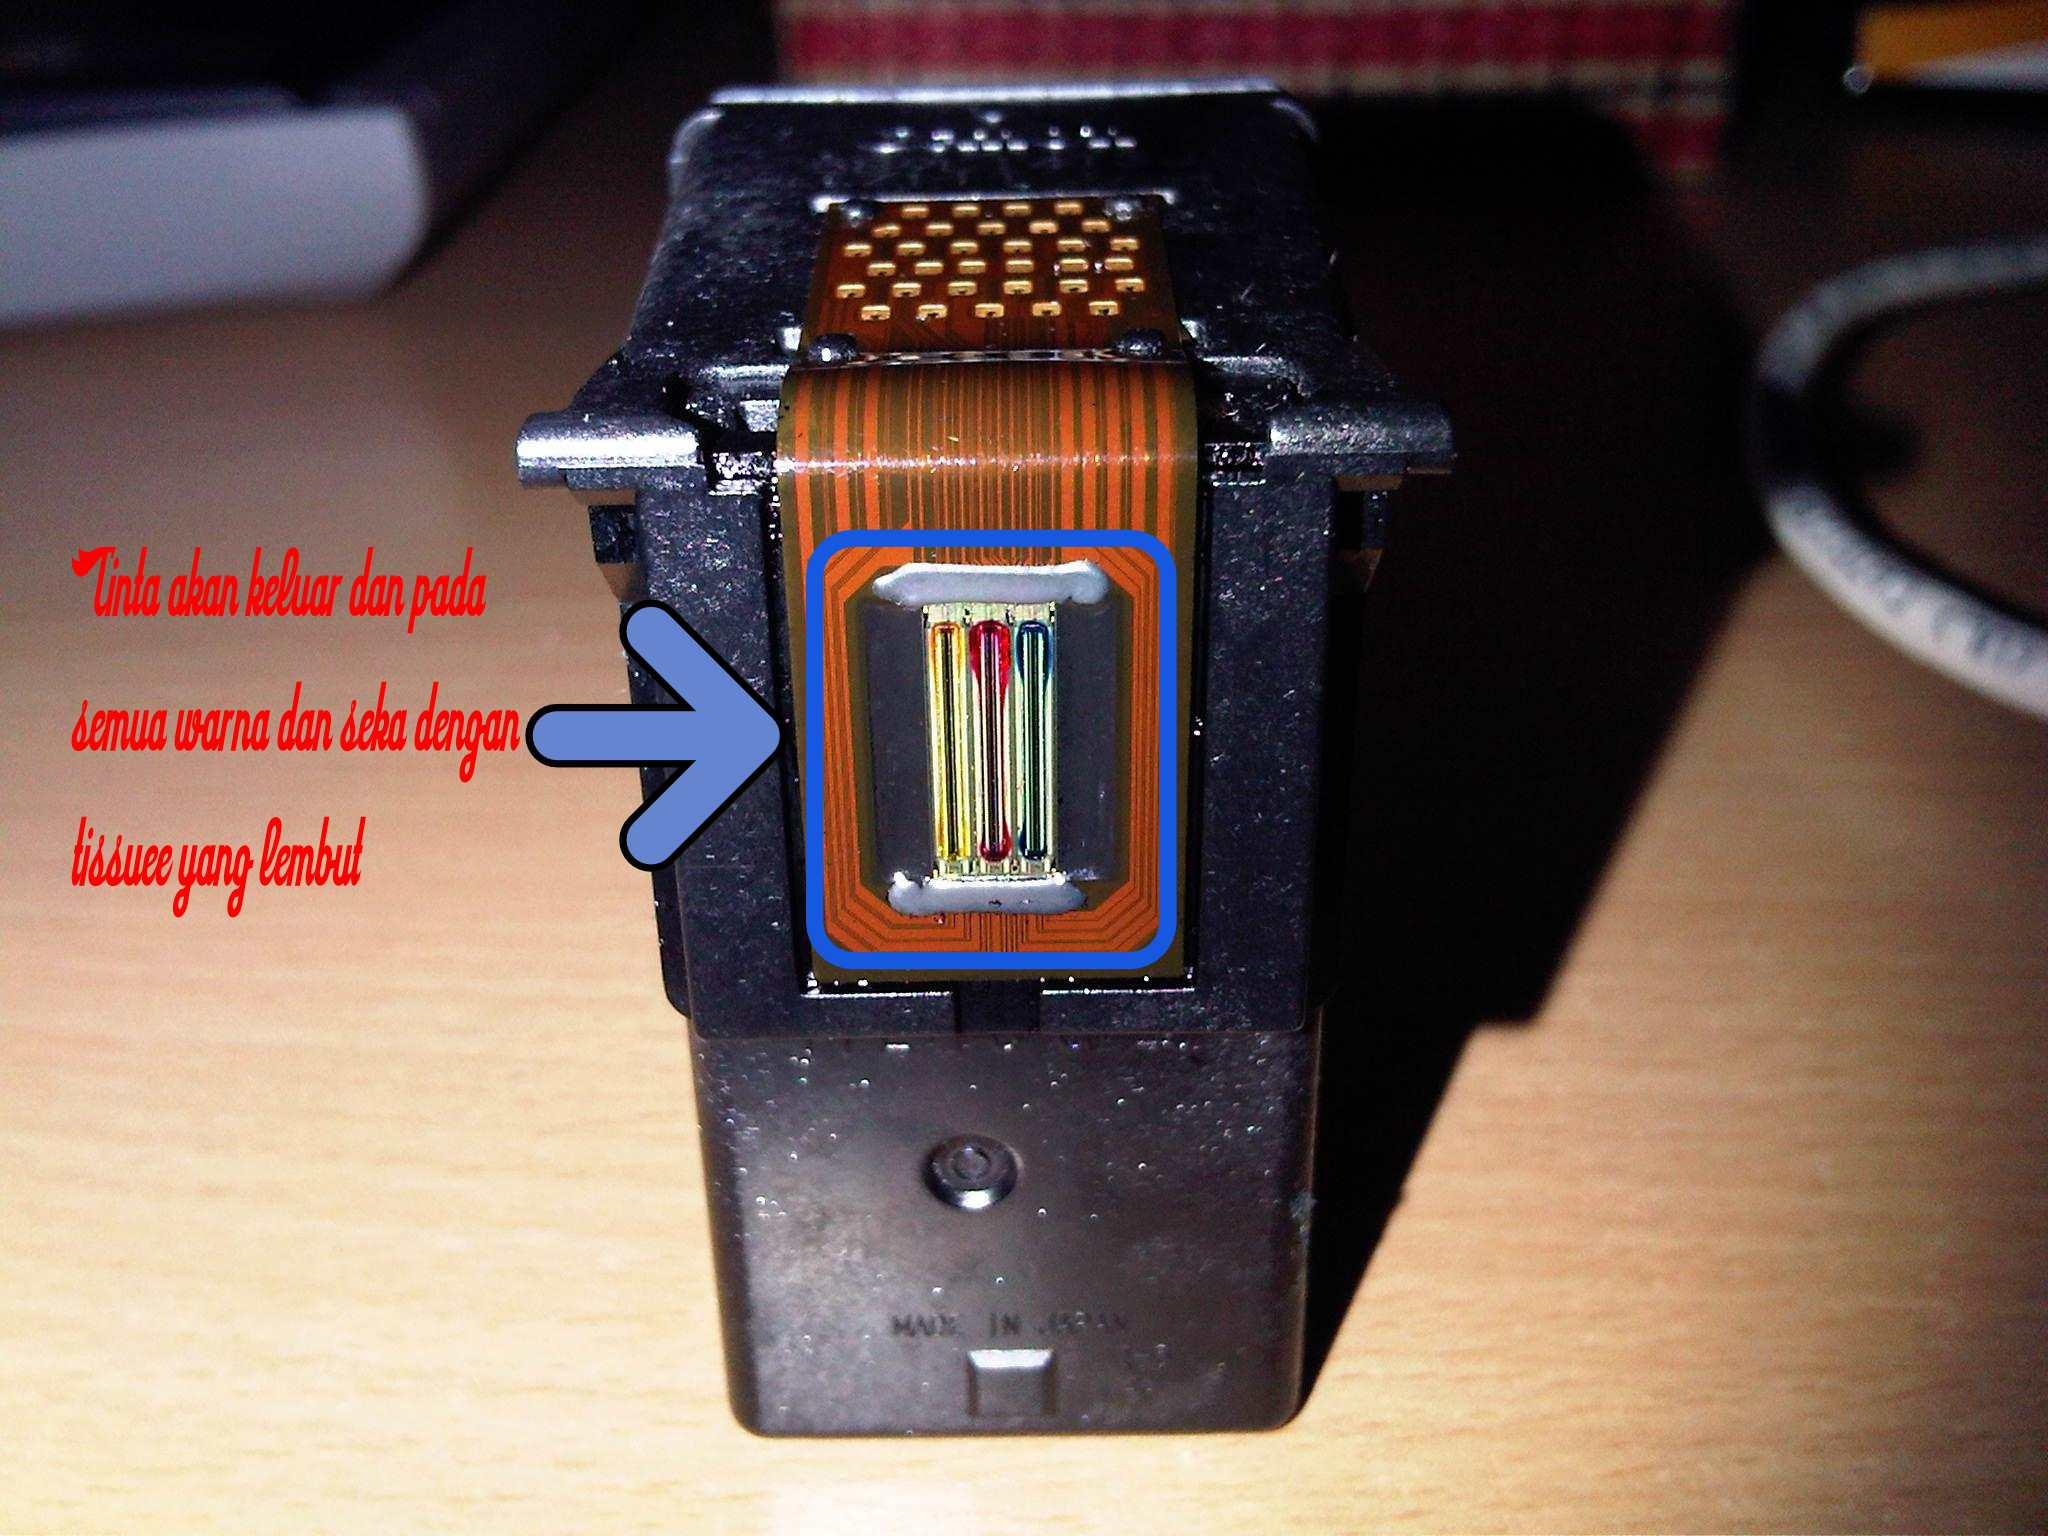 Printer Canon Ip1980 Penyedot Tinta Penuh - Alternative Energy